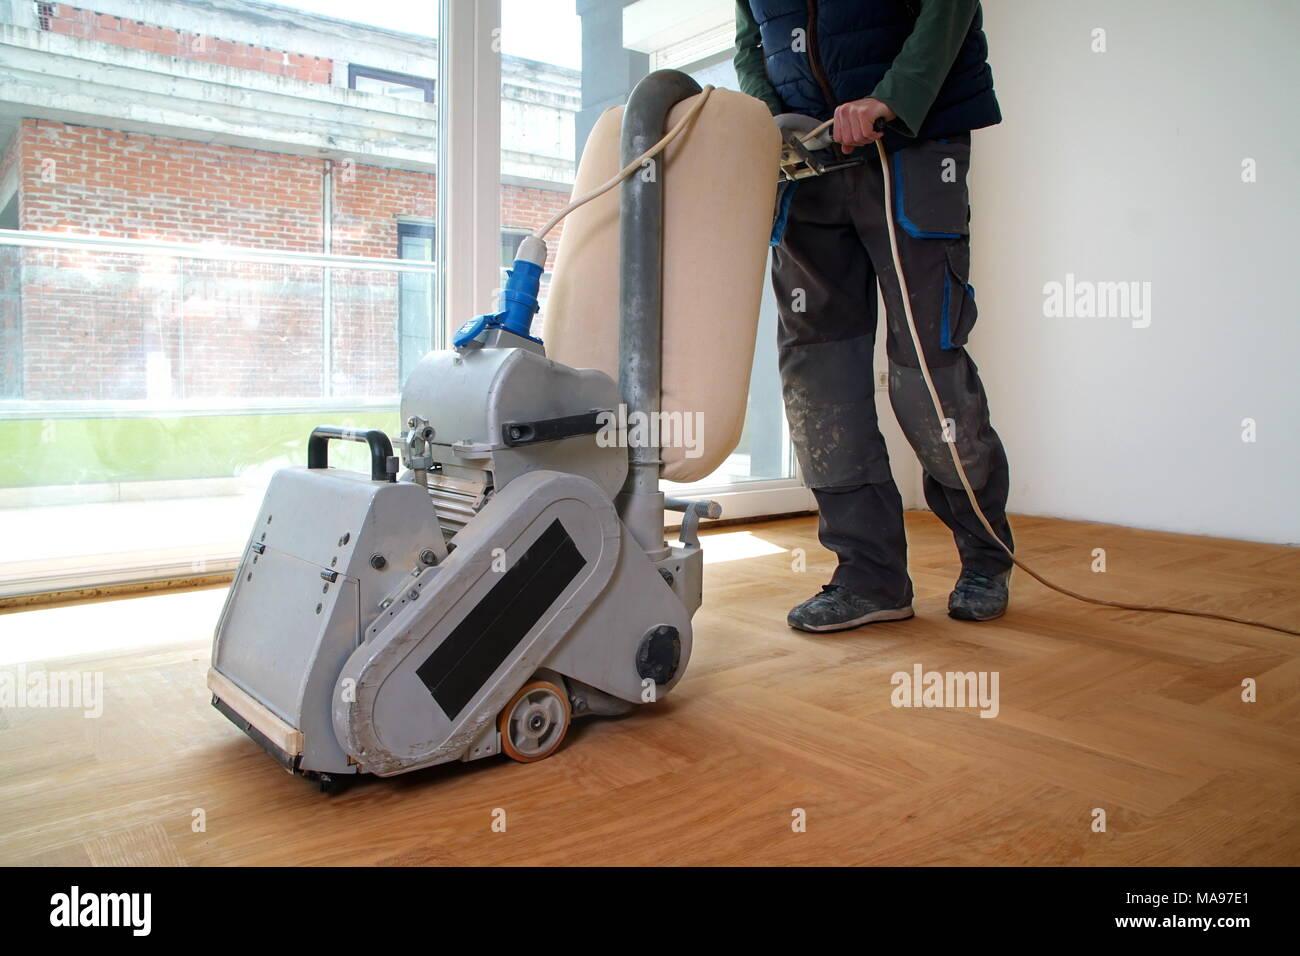 Sanding Hardwood Floor With The Grinding Machine Repair In The